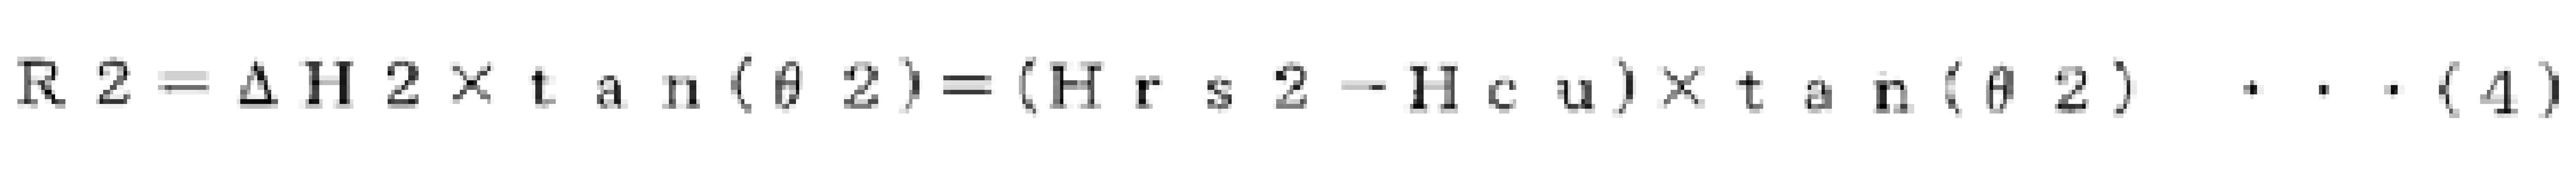 Figure 112019101508504-pct00004